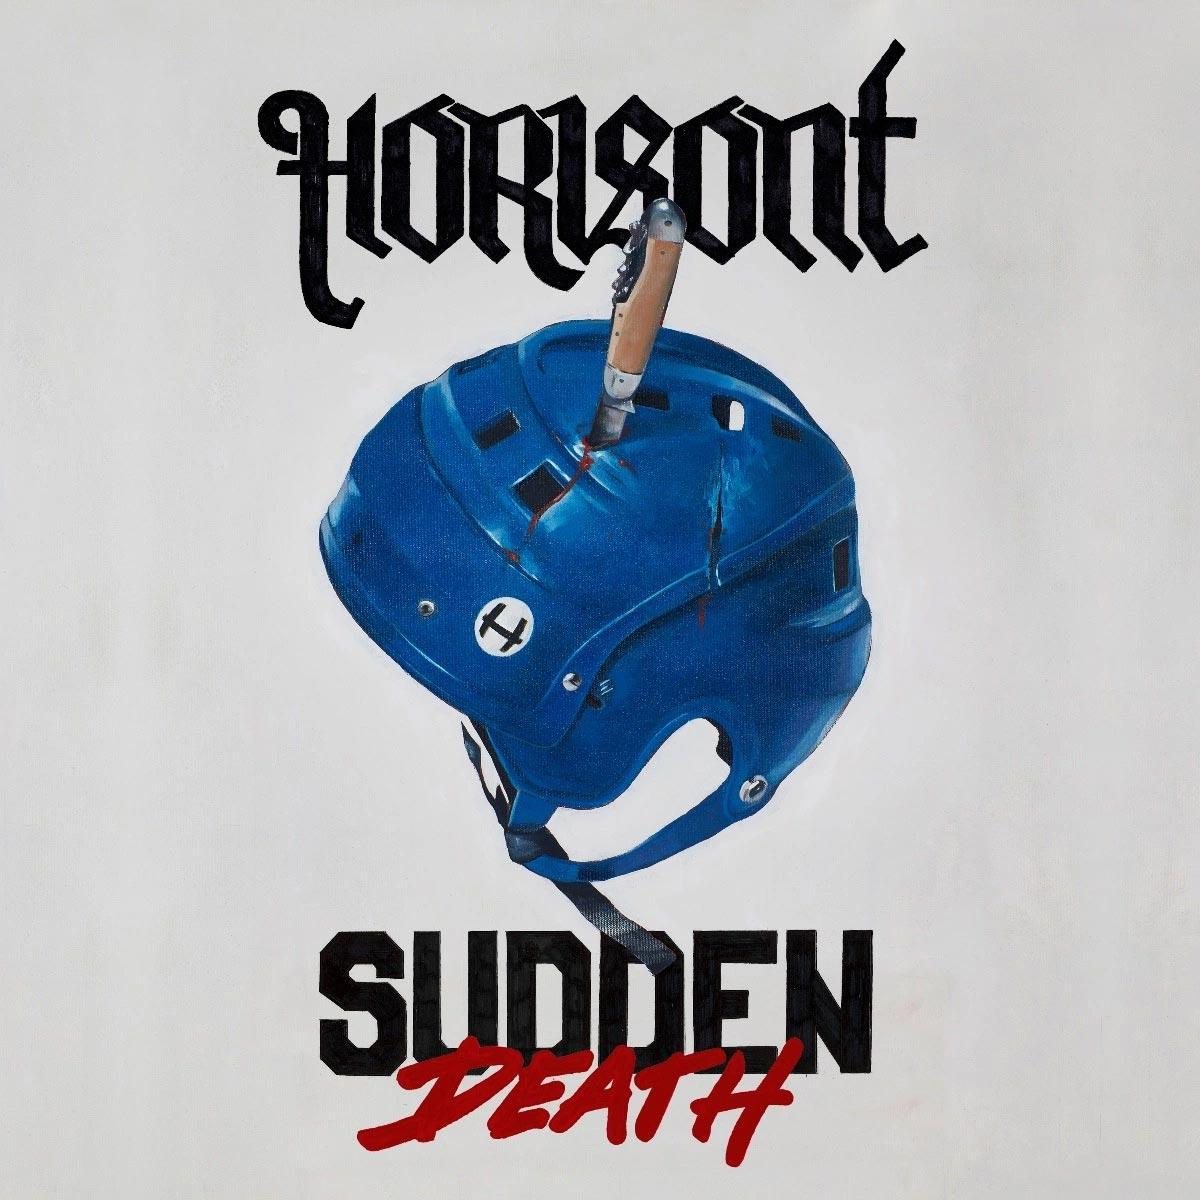 La liga Azkenera 2020. Disco de la semana: Marilyn Manson - We Are Chaos - Página 5 Horisont-sudden-death